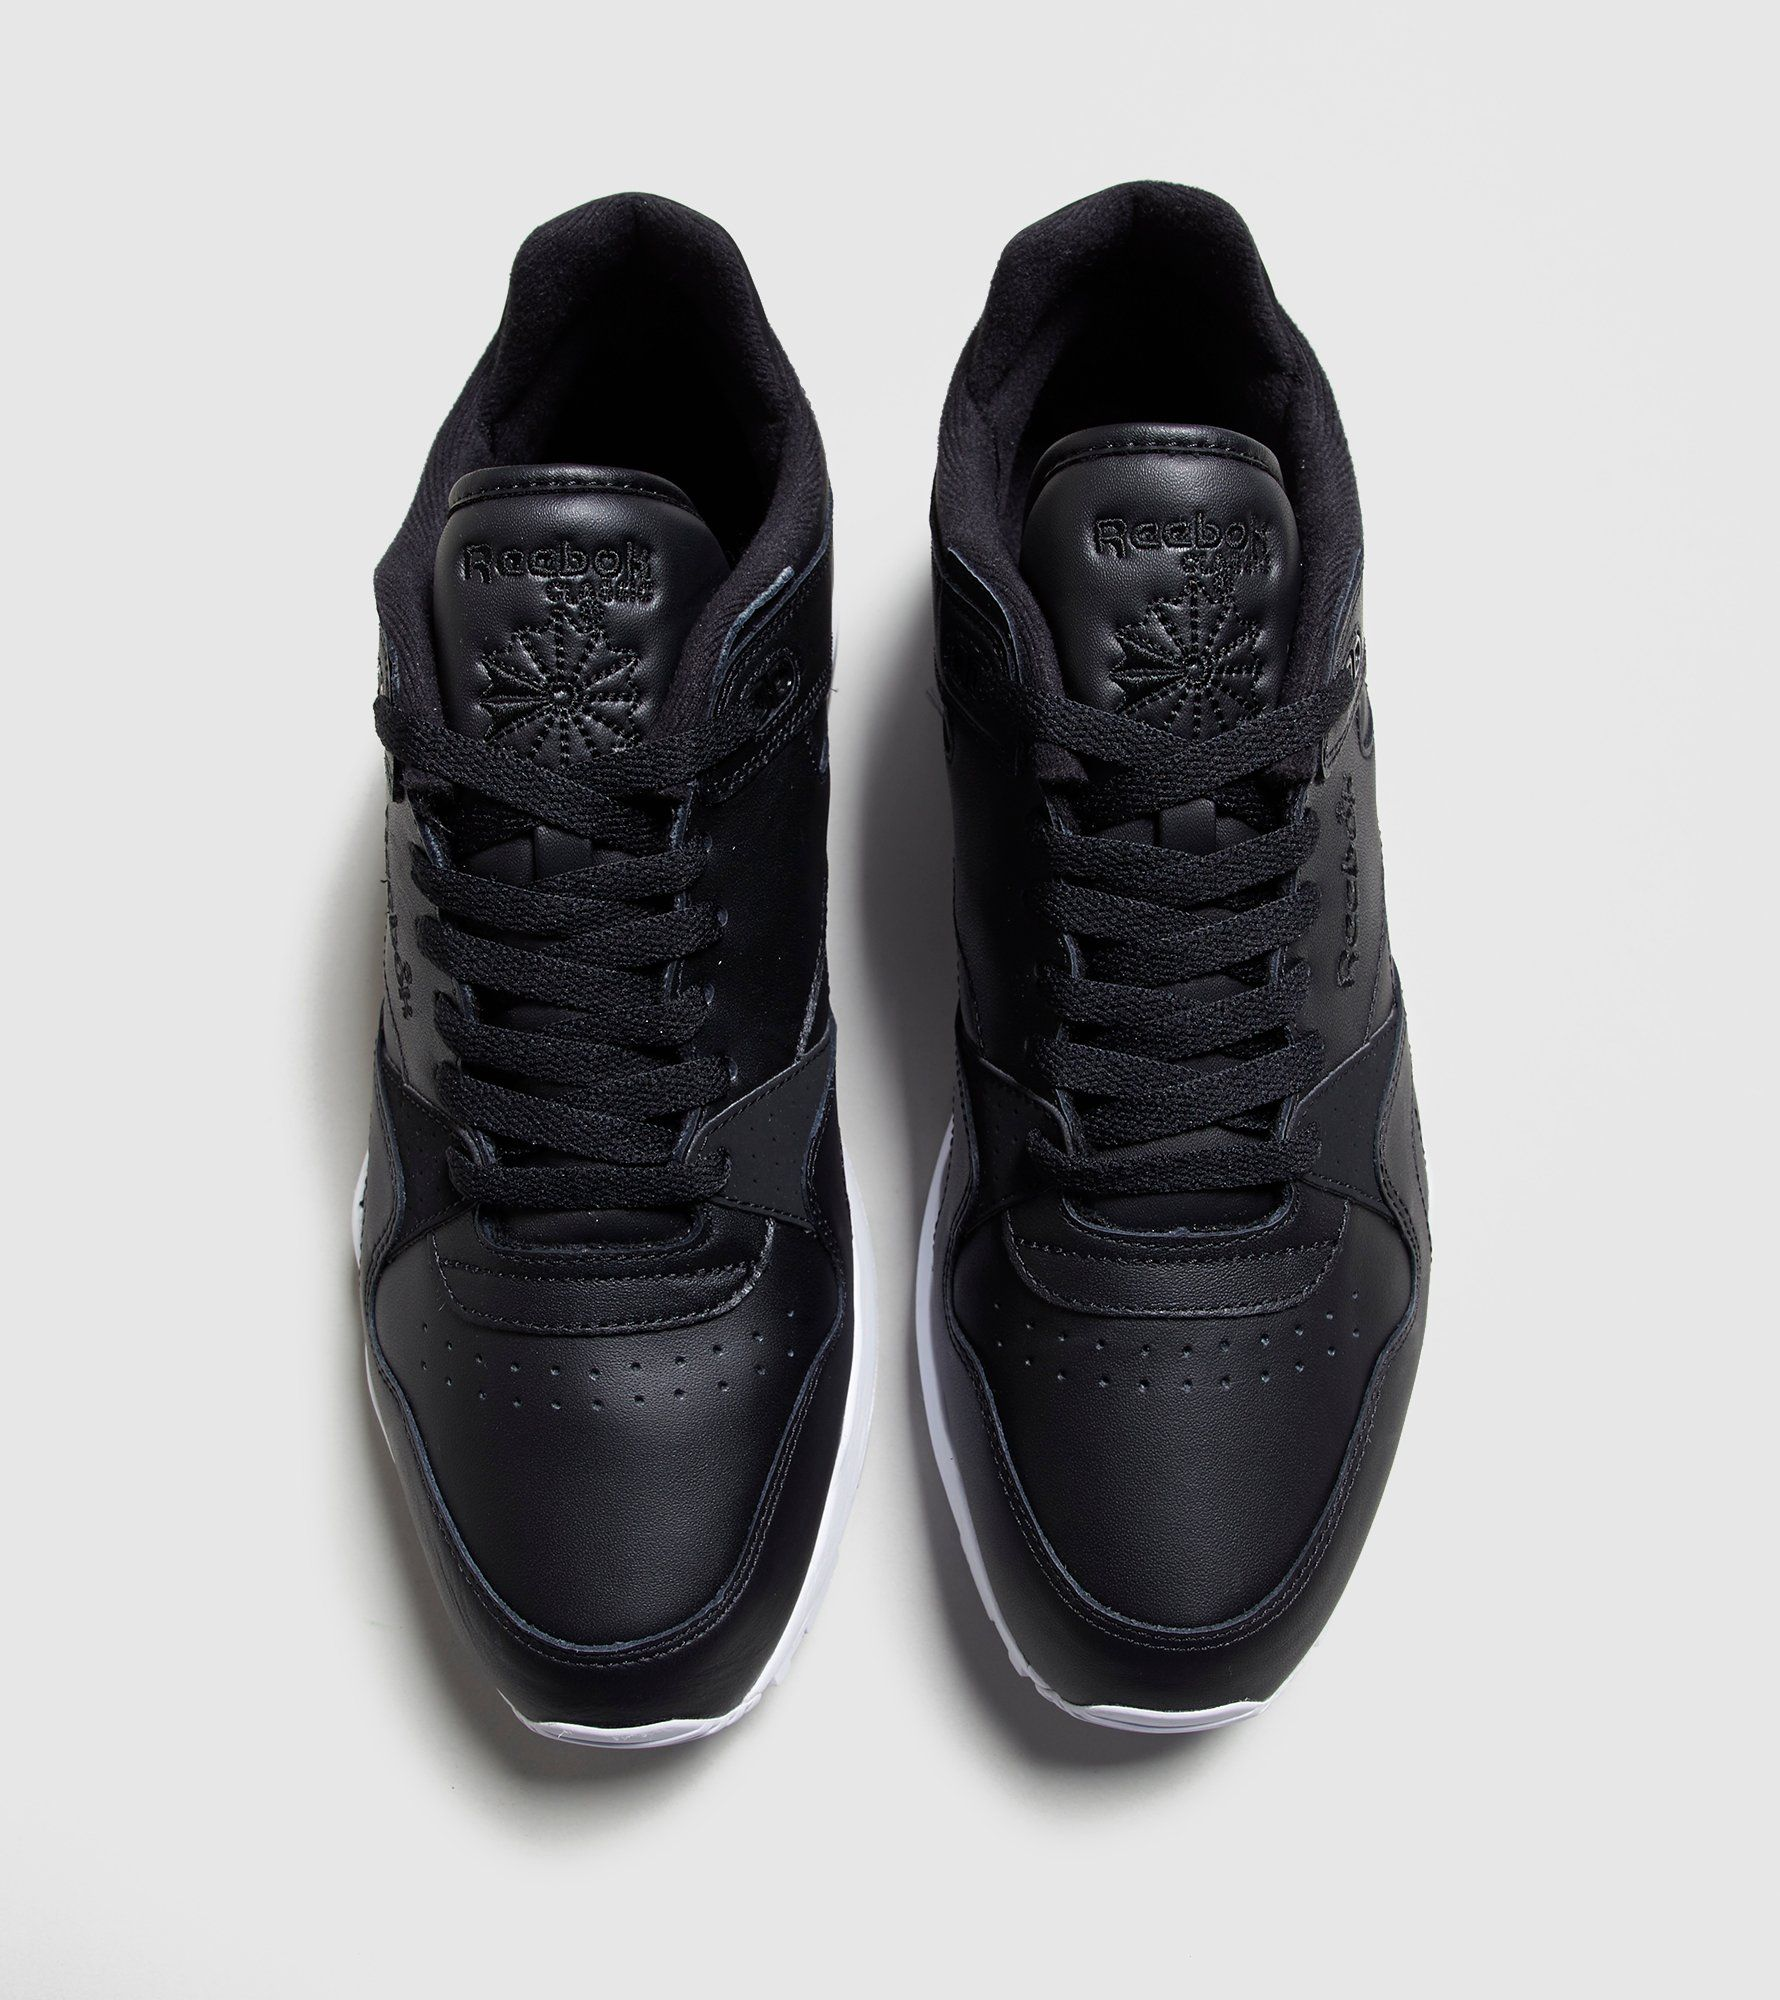 Reebok Classic Leather II